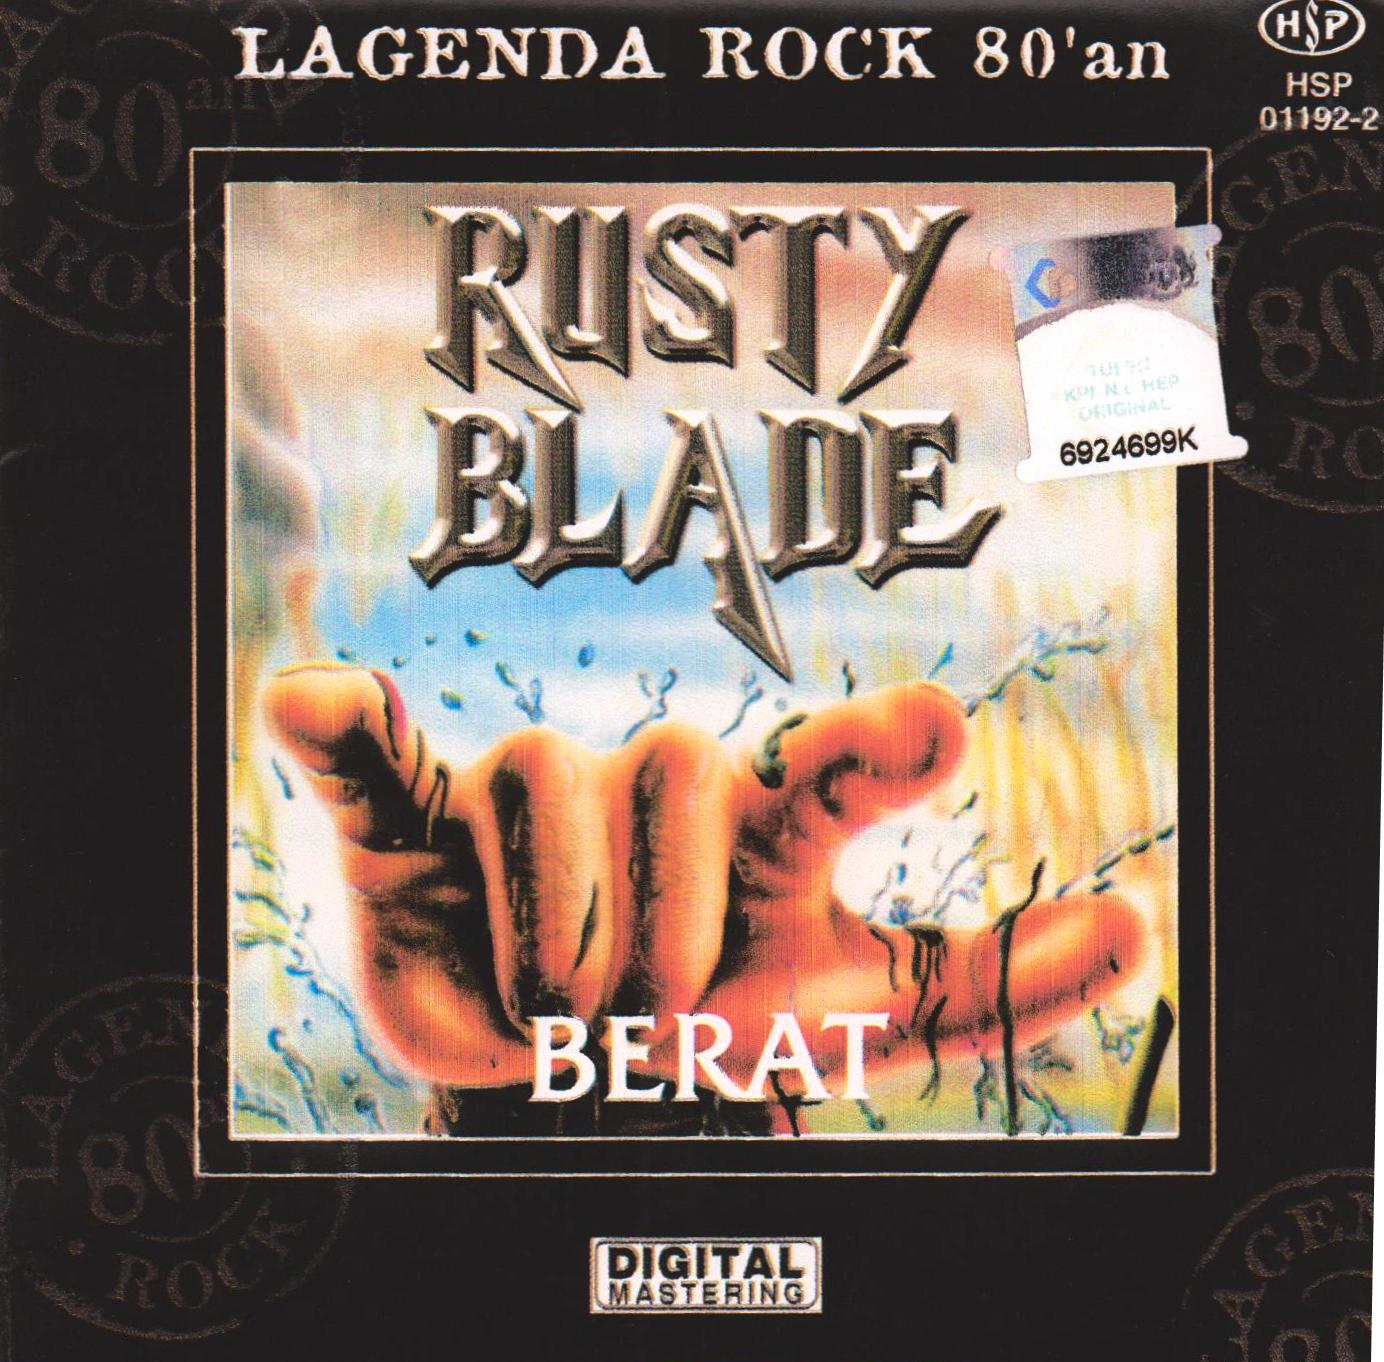 RUSTY BLADE